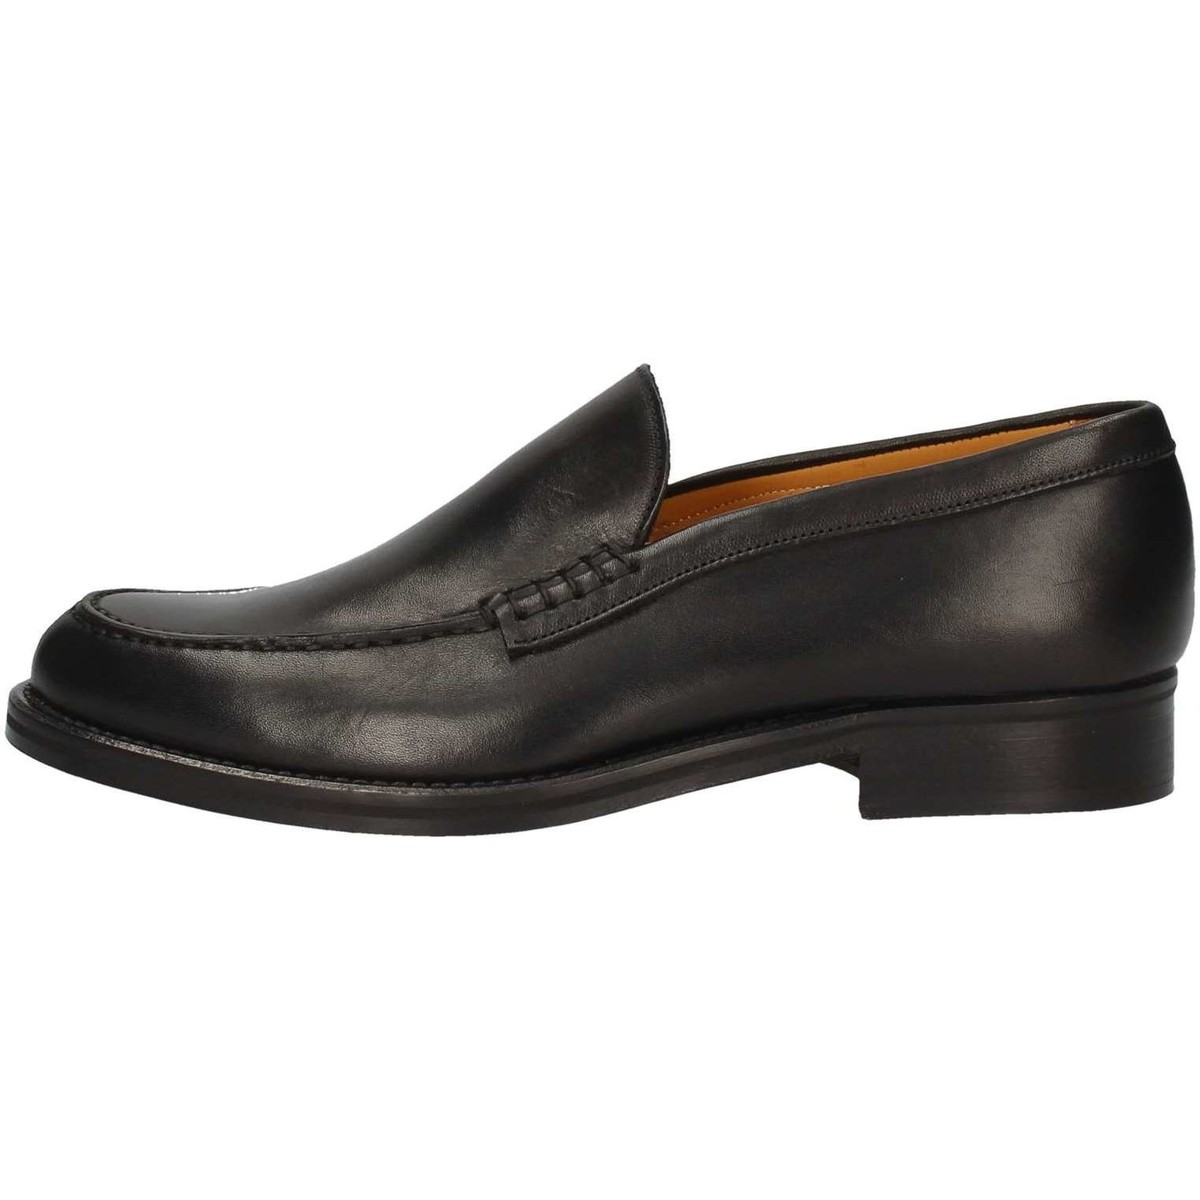 Hudson F06 Mokassin Mann Schwarz Schwarz - Schuhe Slipper Herren 112,10 €